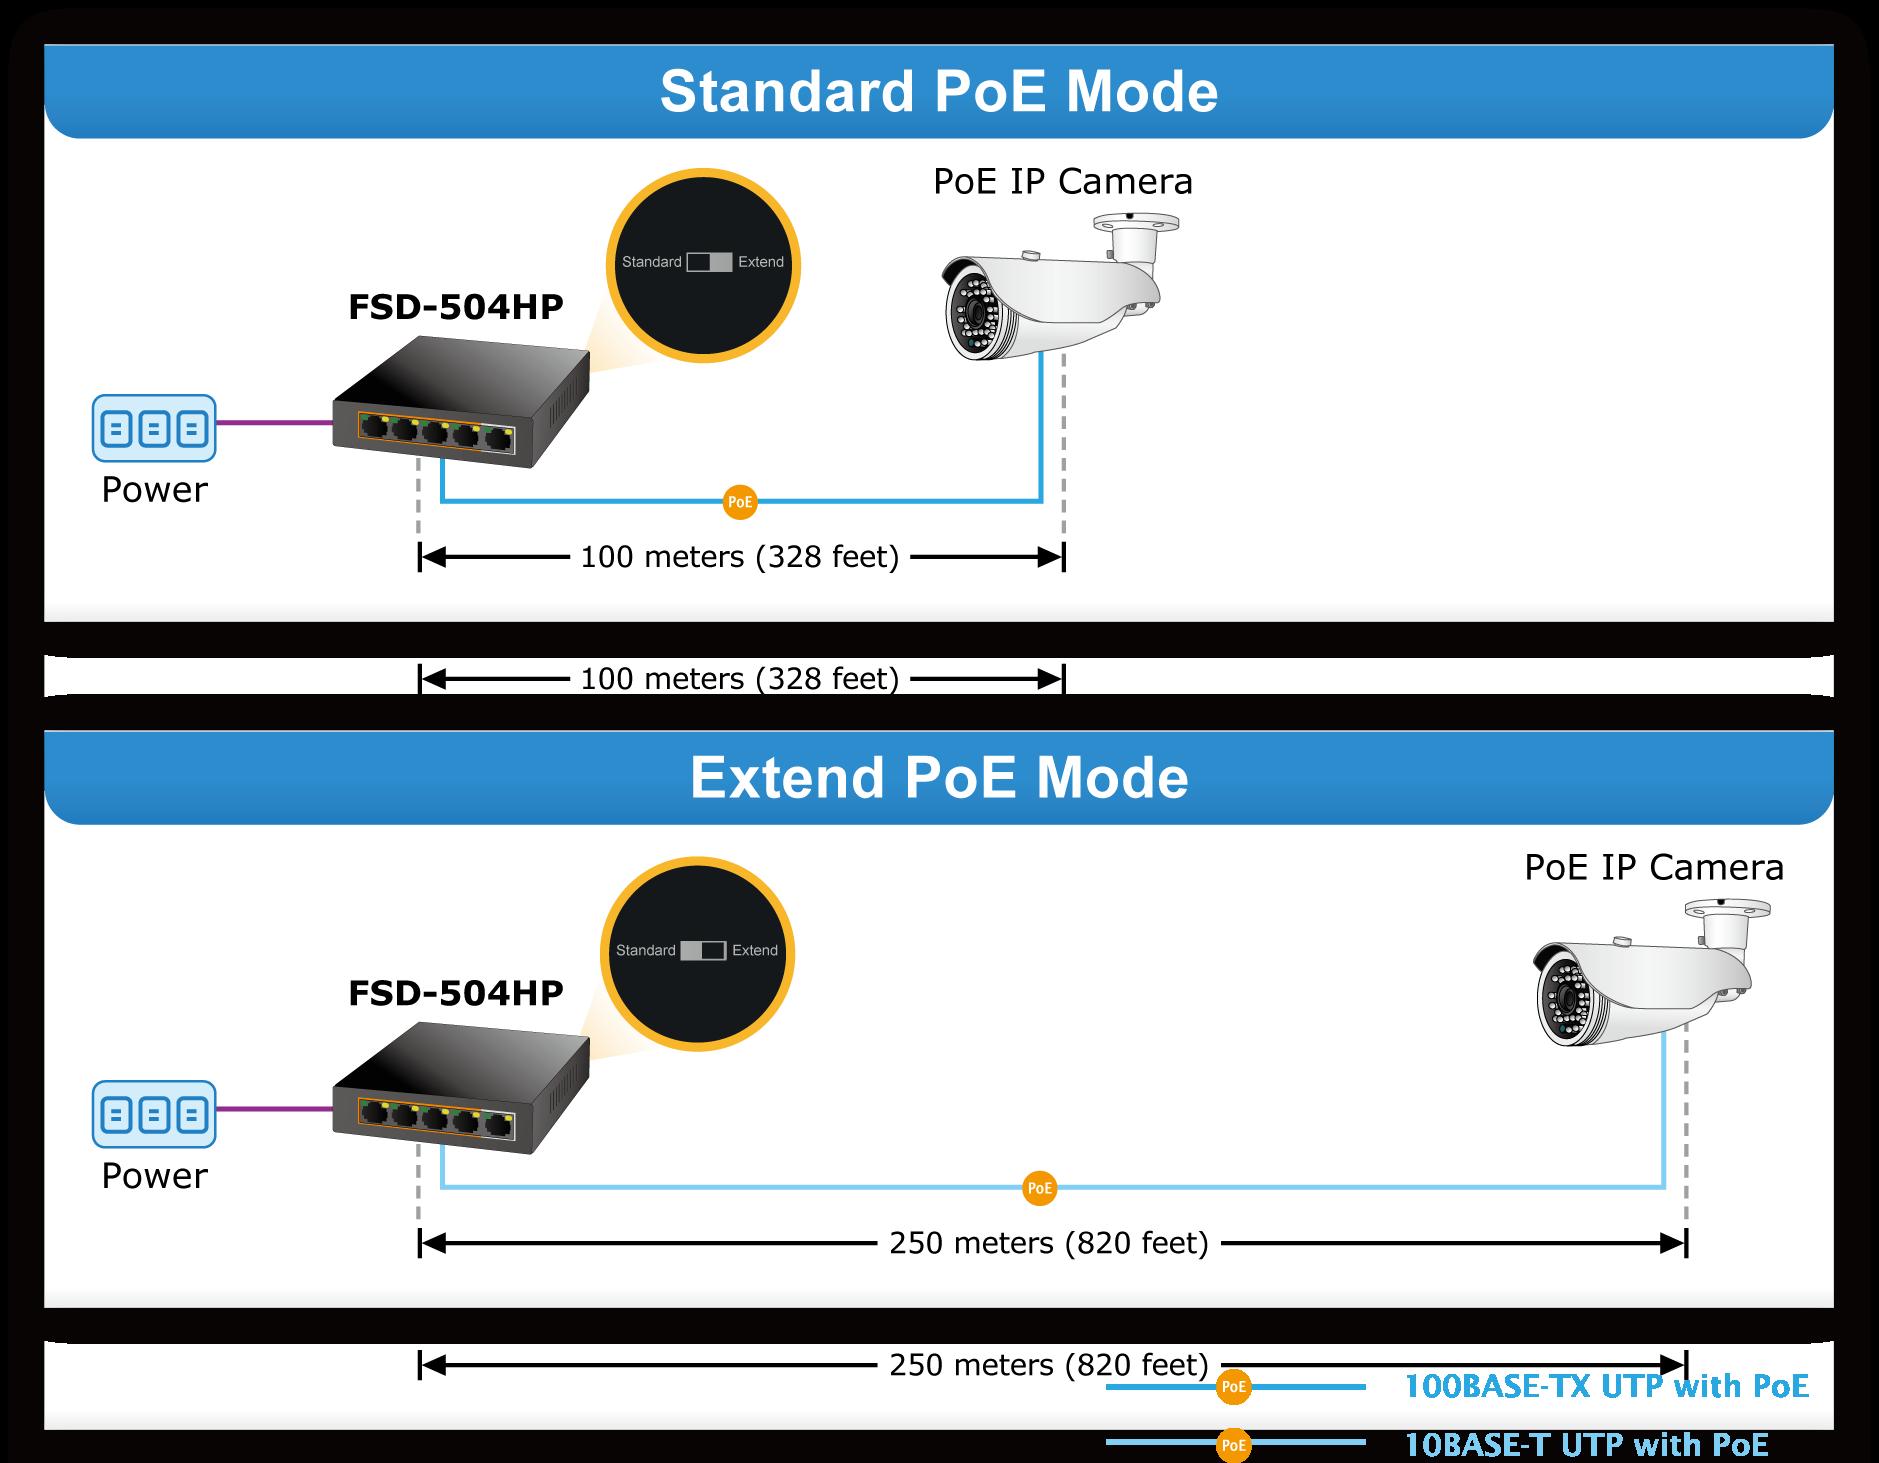 FSD-504HP Application